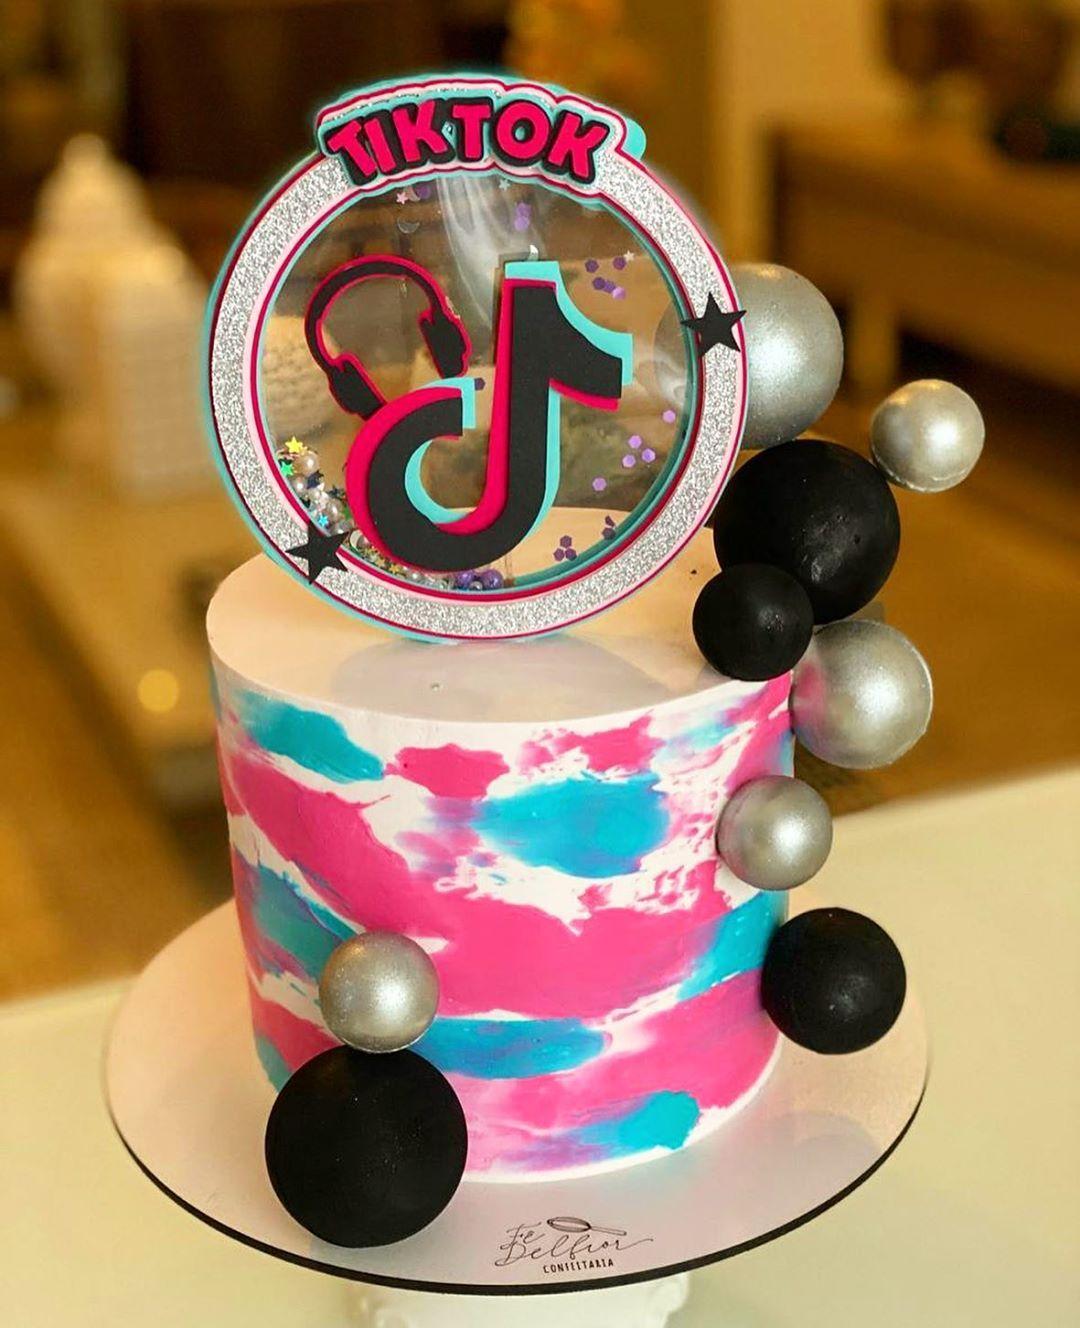 Pin by Heather Walper on Zs cake Idas | Birthday cake